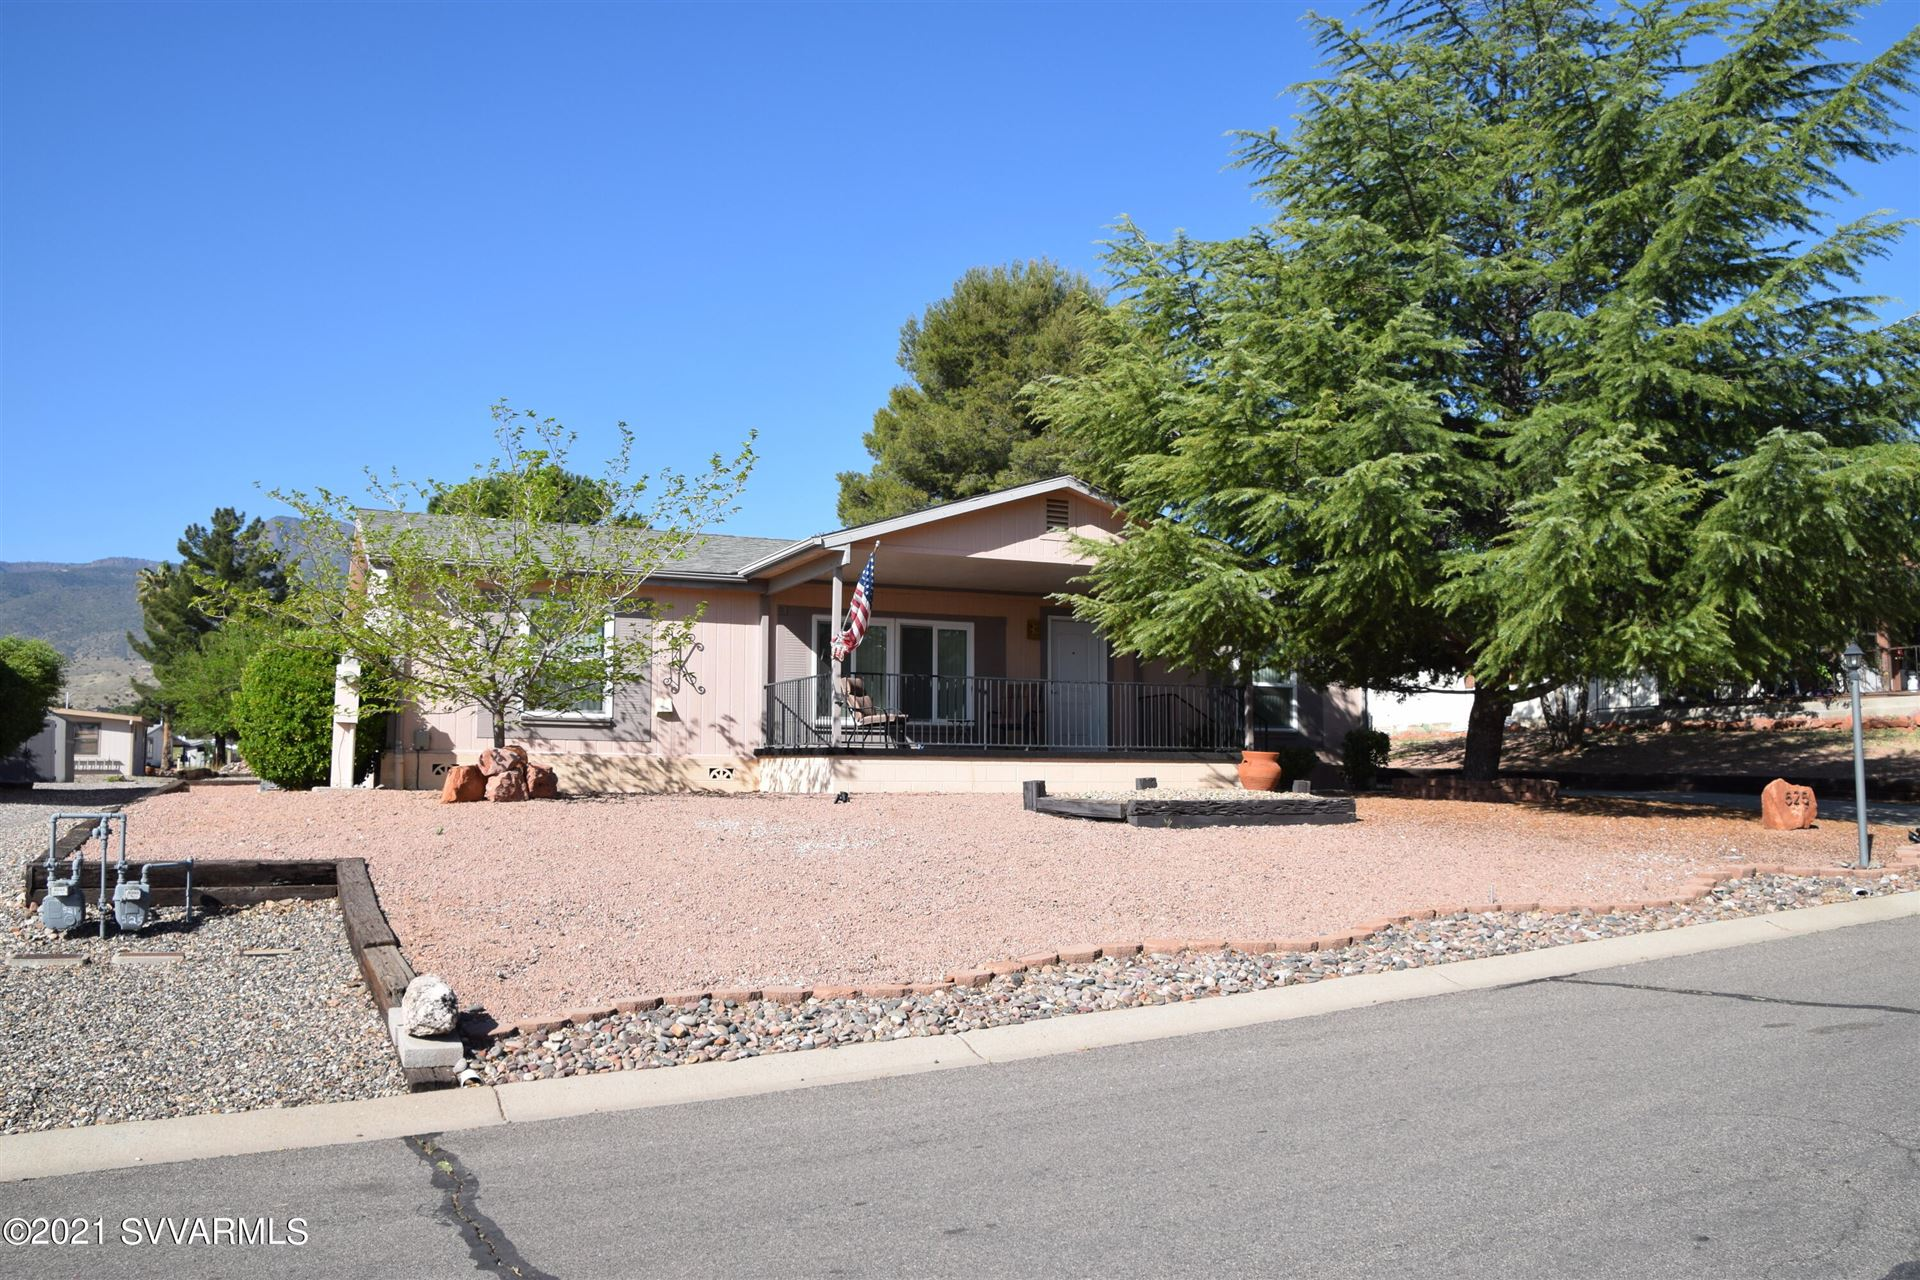 Photo of 525 Mingus Shadows Drive, Clarkdale, AZ 86324 (MLS # 526135)